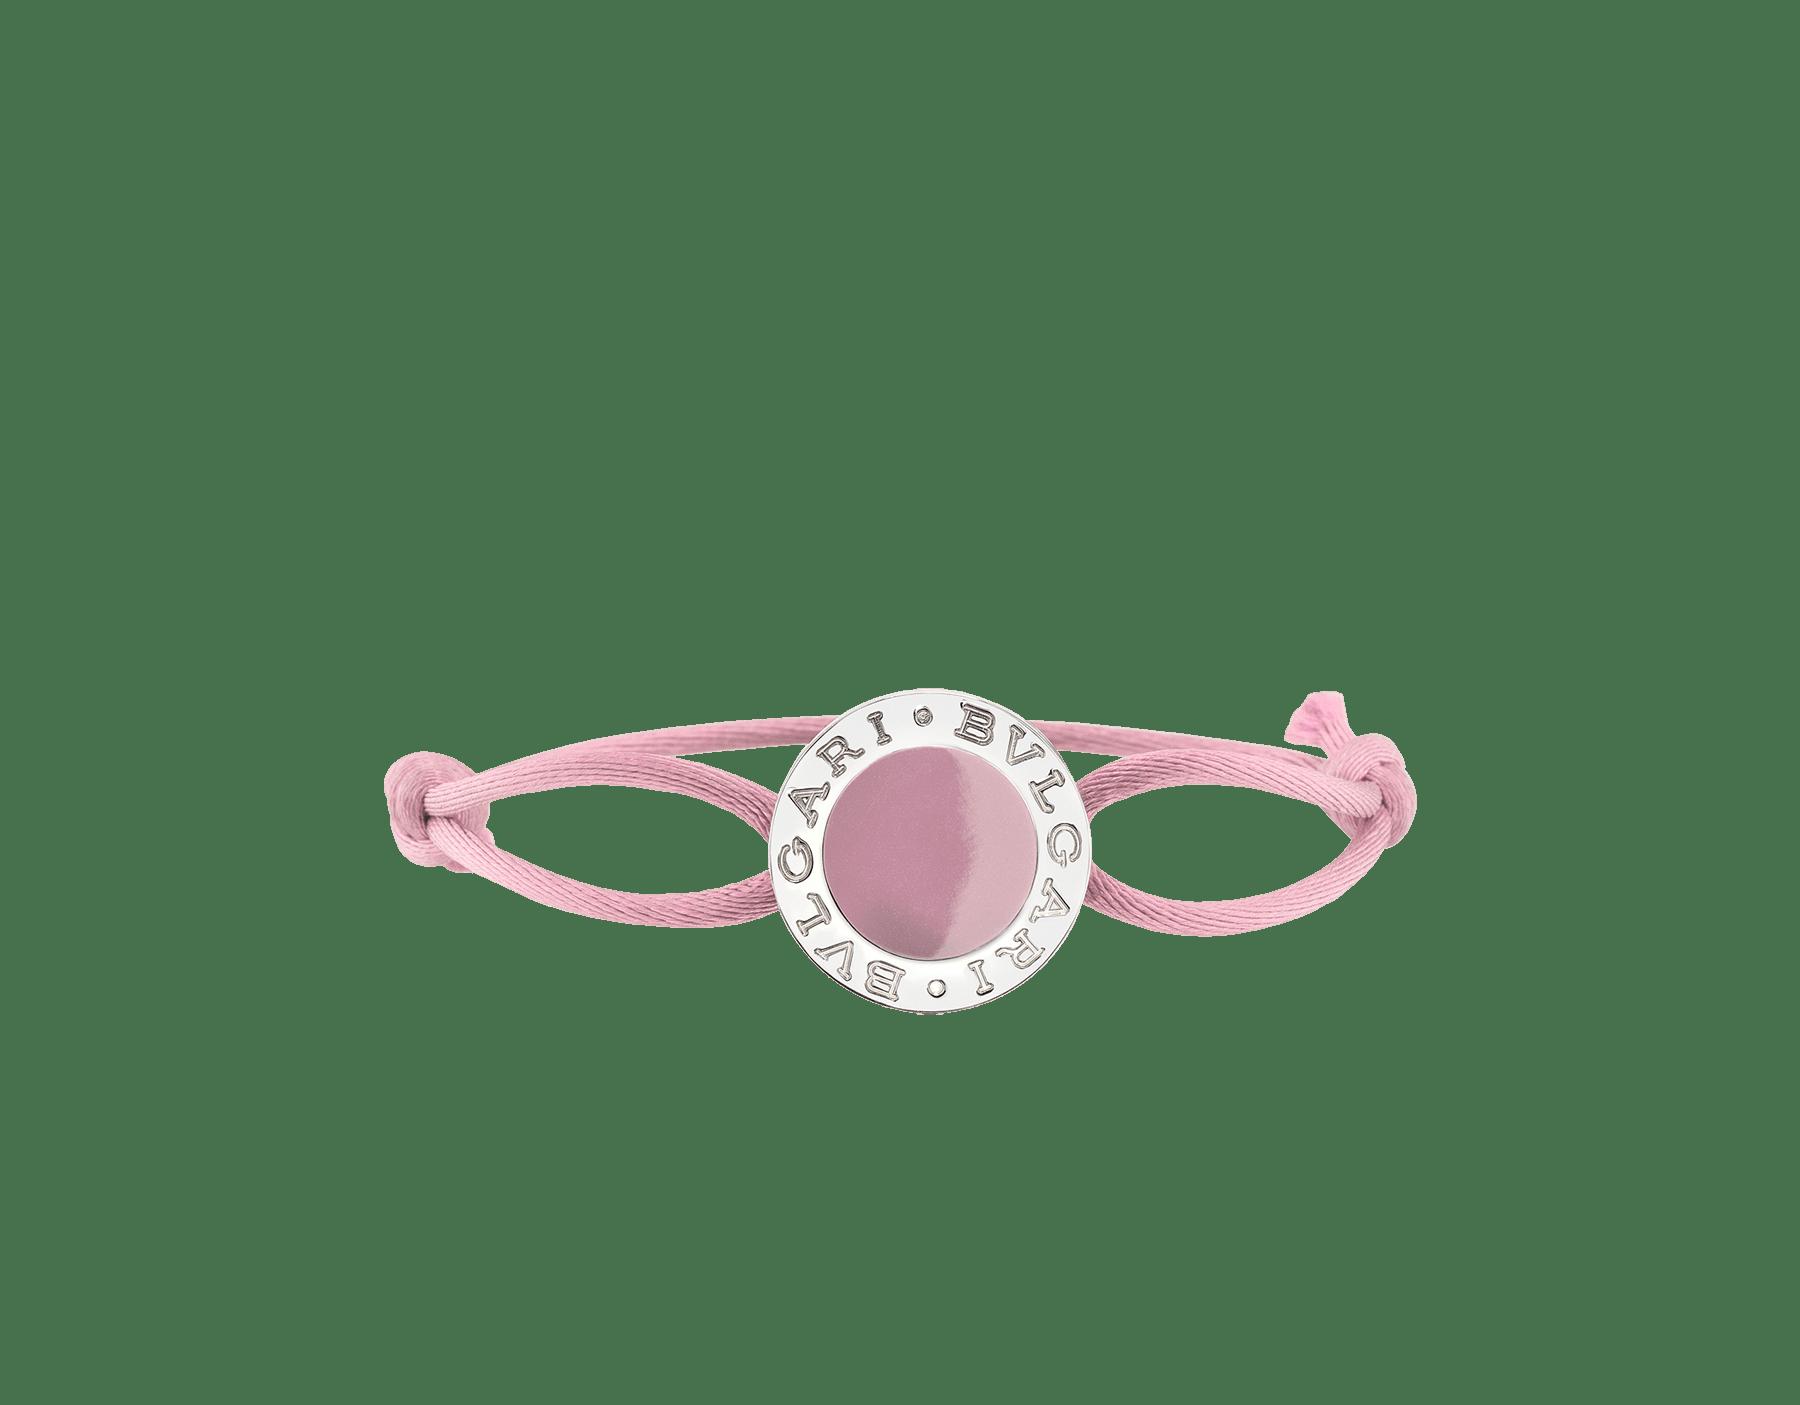 BVLGARI BVLGARI bracelet in flamingo quartz fabric with an iconic logo décor in sterling silver and flamingo quartz enamel. 288454 image 1